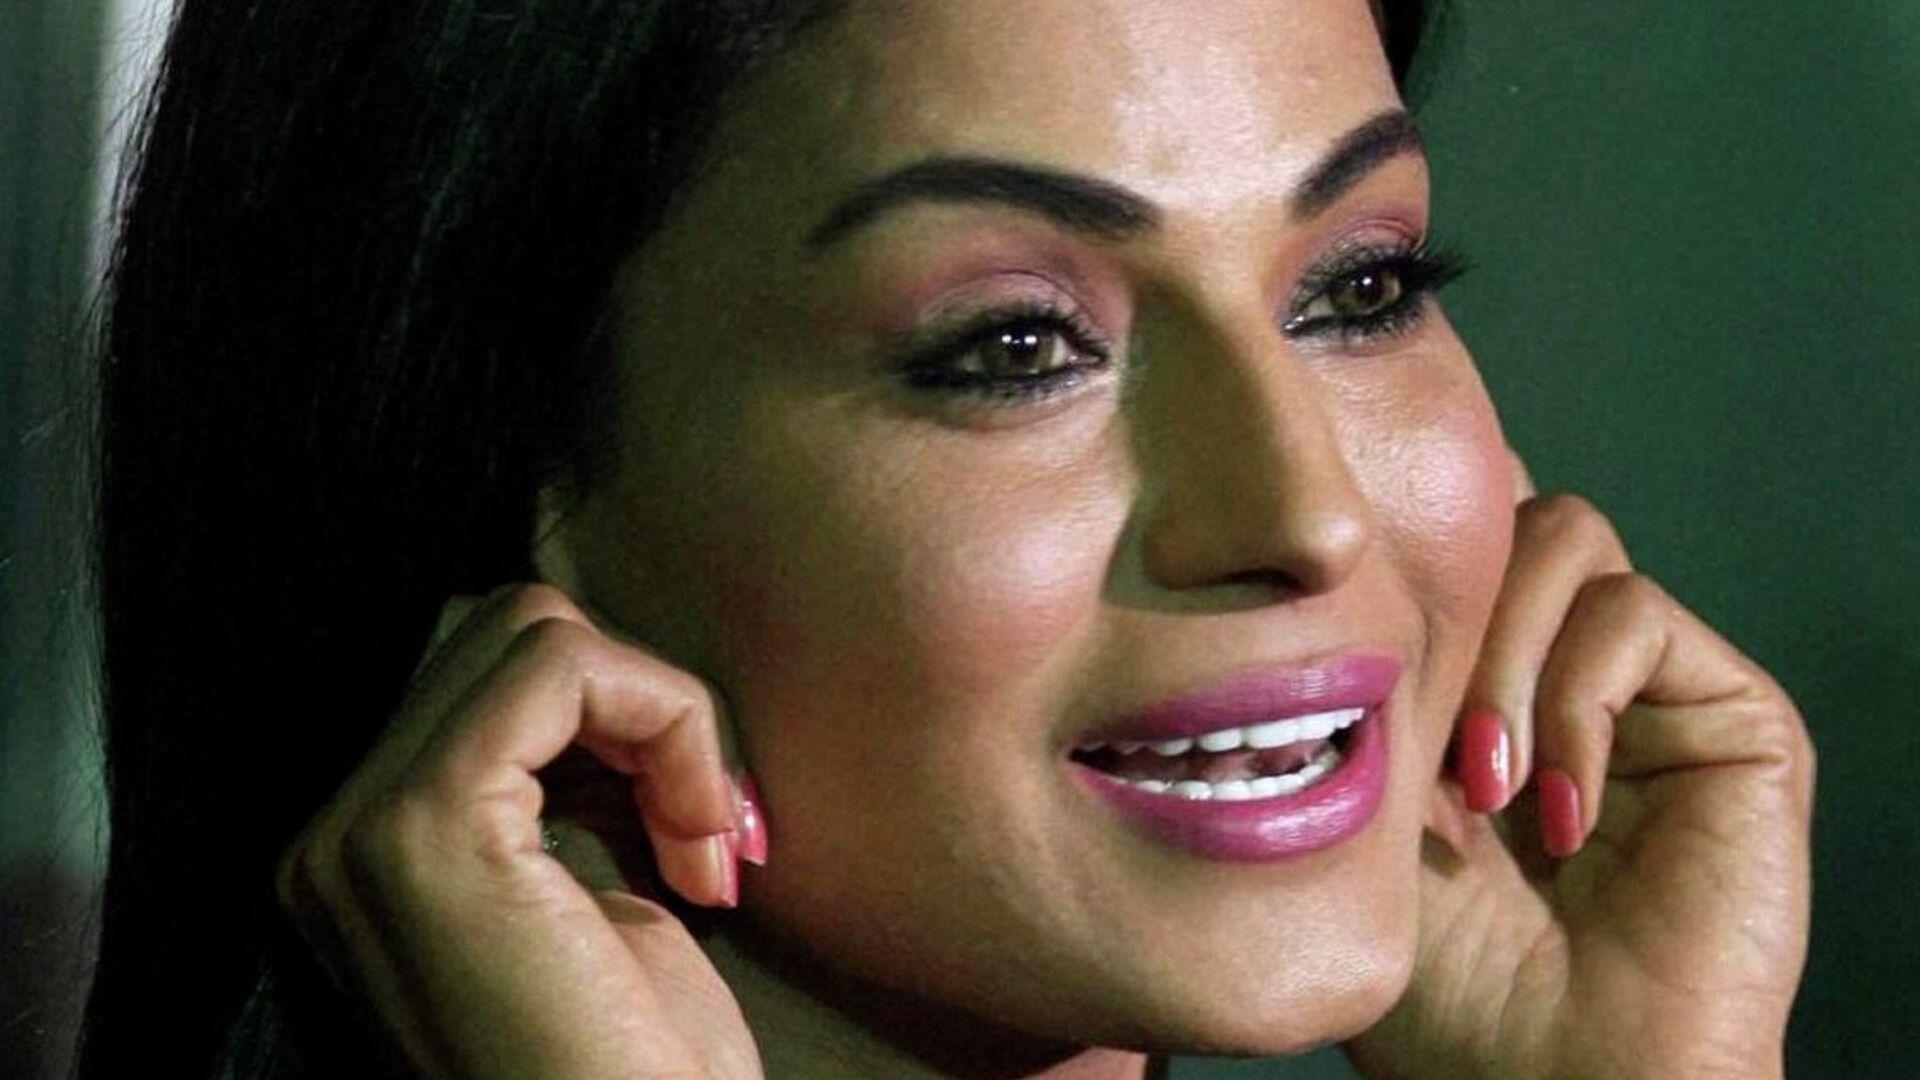 La actriz y modelo paquistaní Veena Malik - Sputnik Mundo, 1920, 13.05.2021